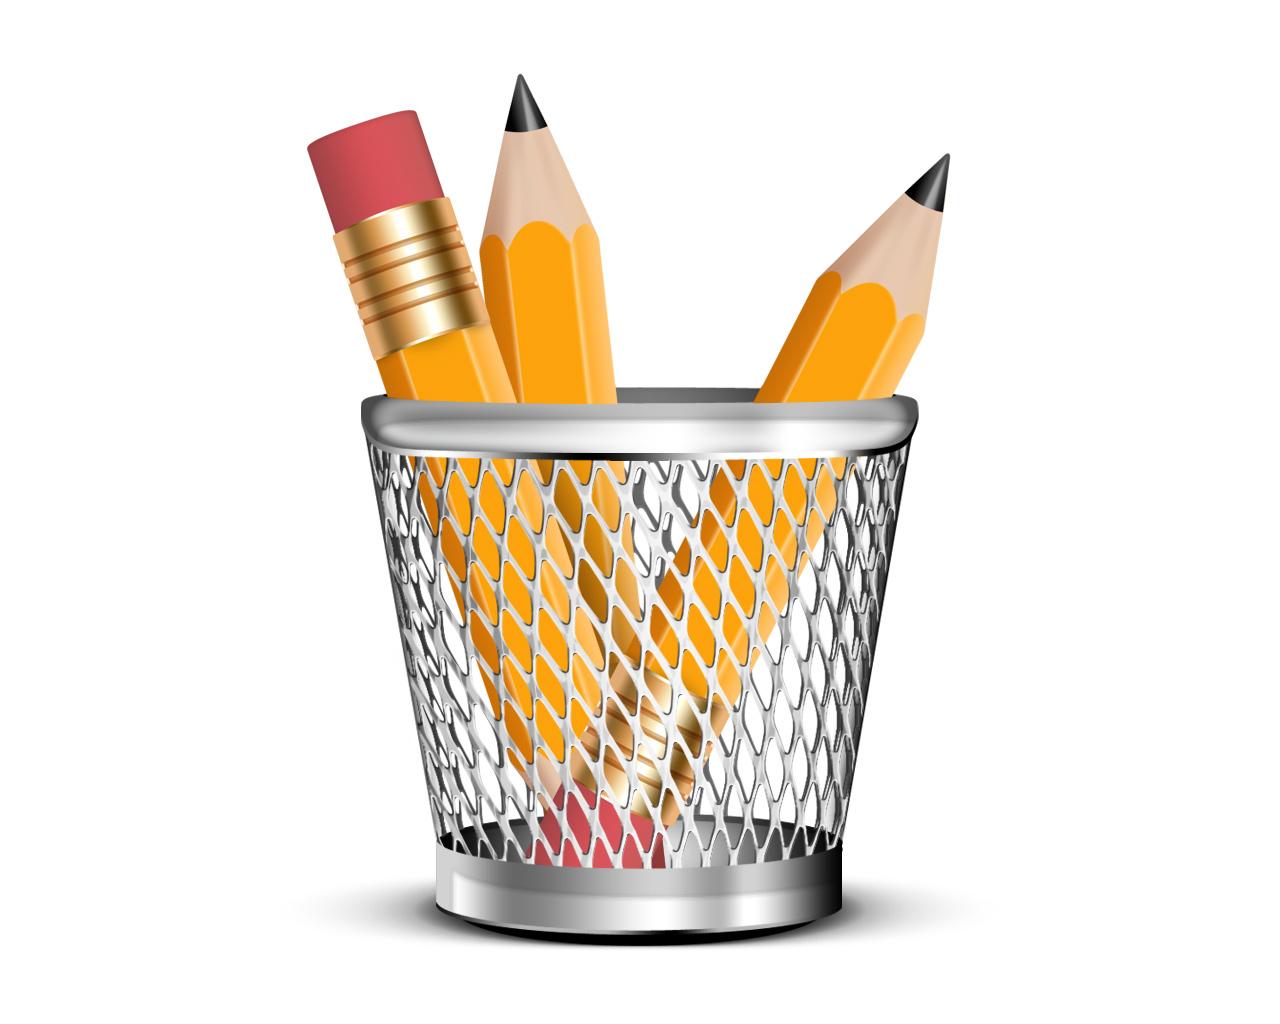 icon, pencils, yellow, psd, карандаши, желтые, корзинка